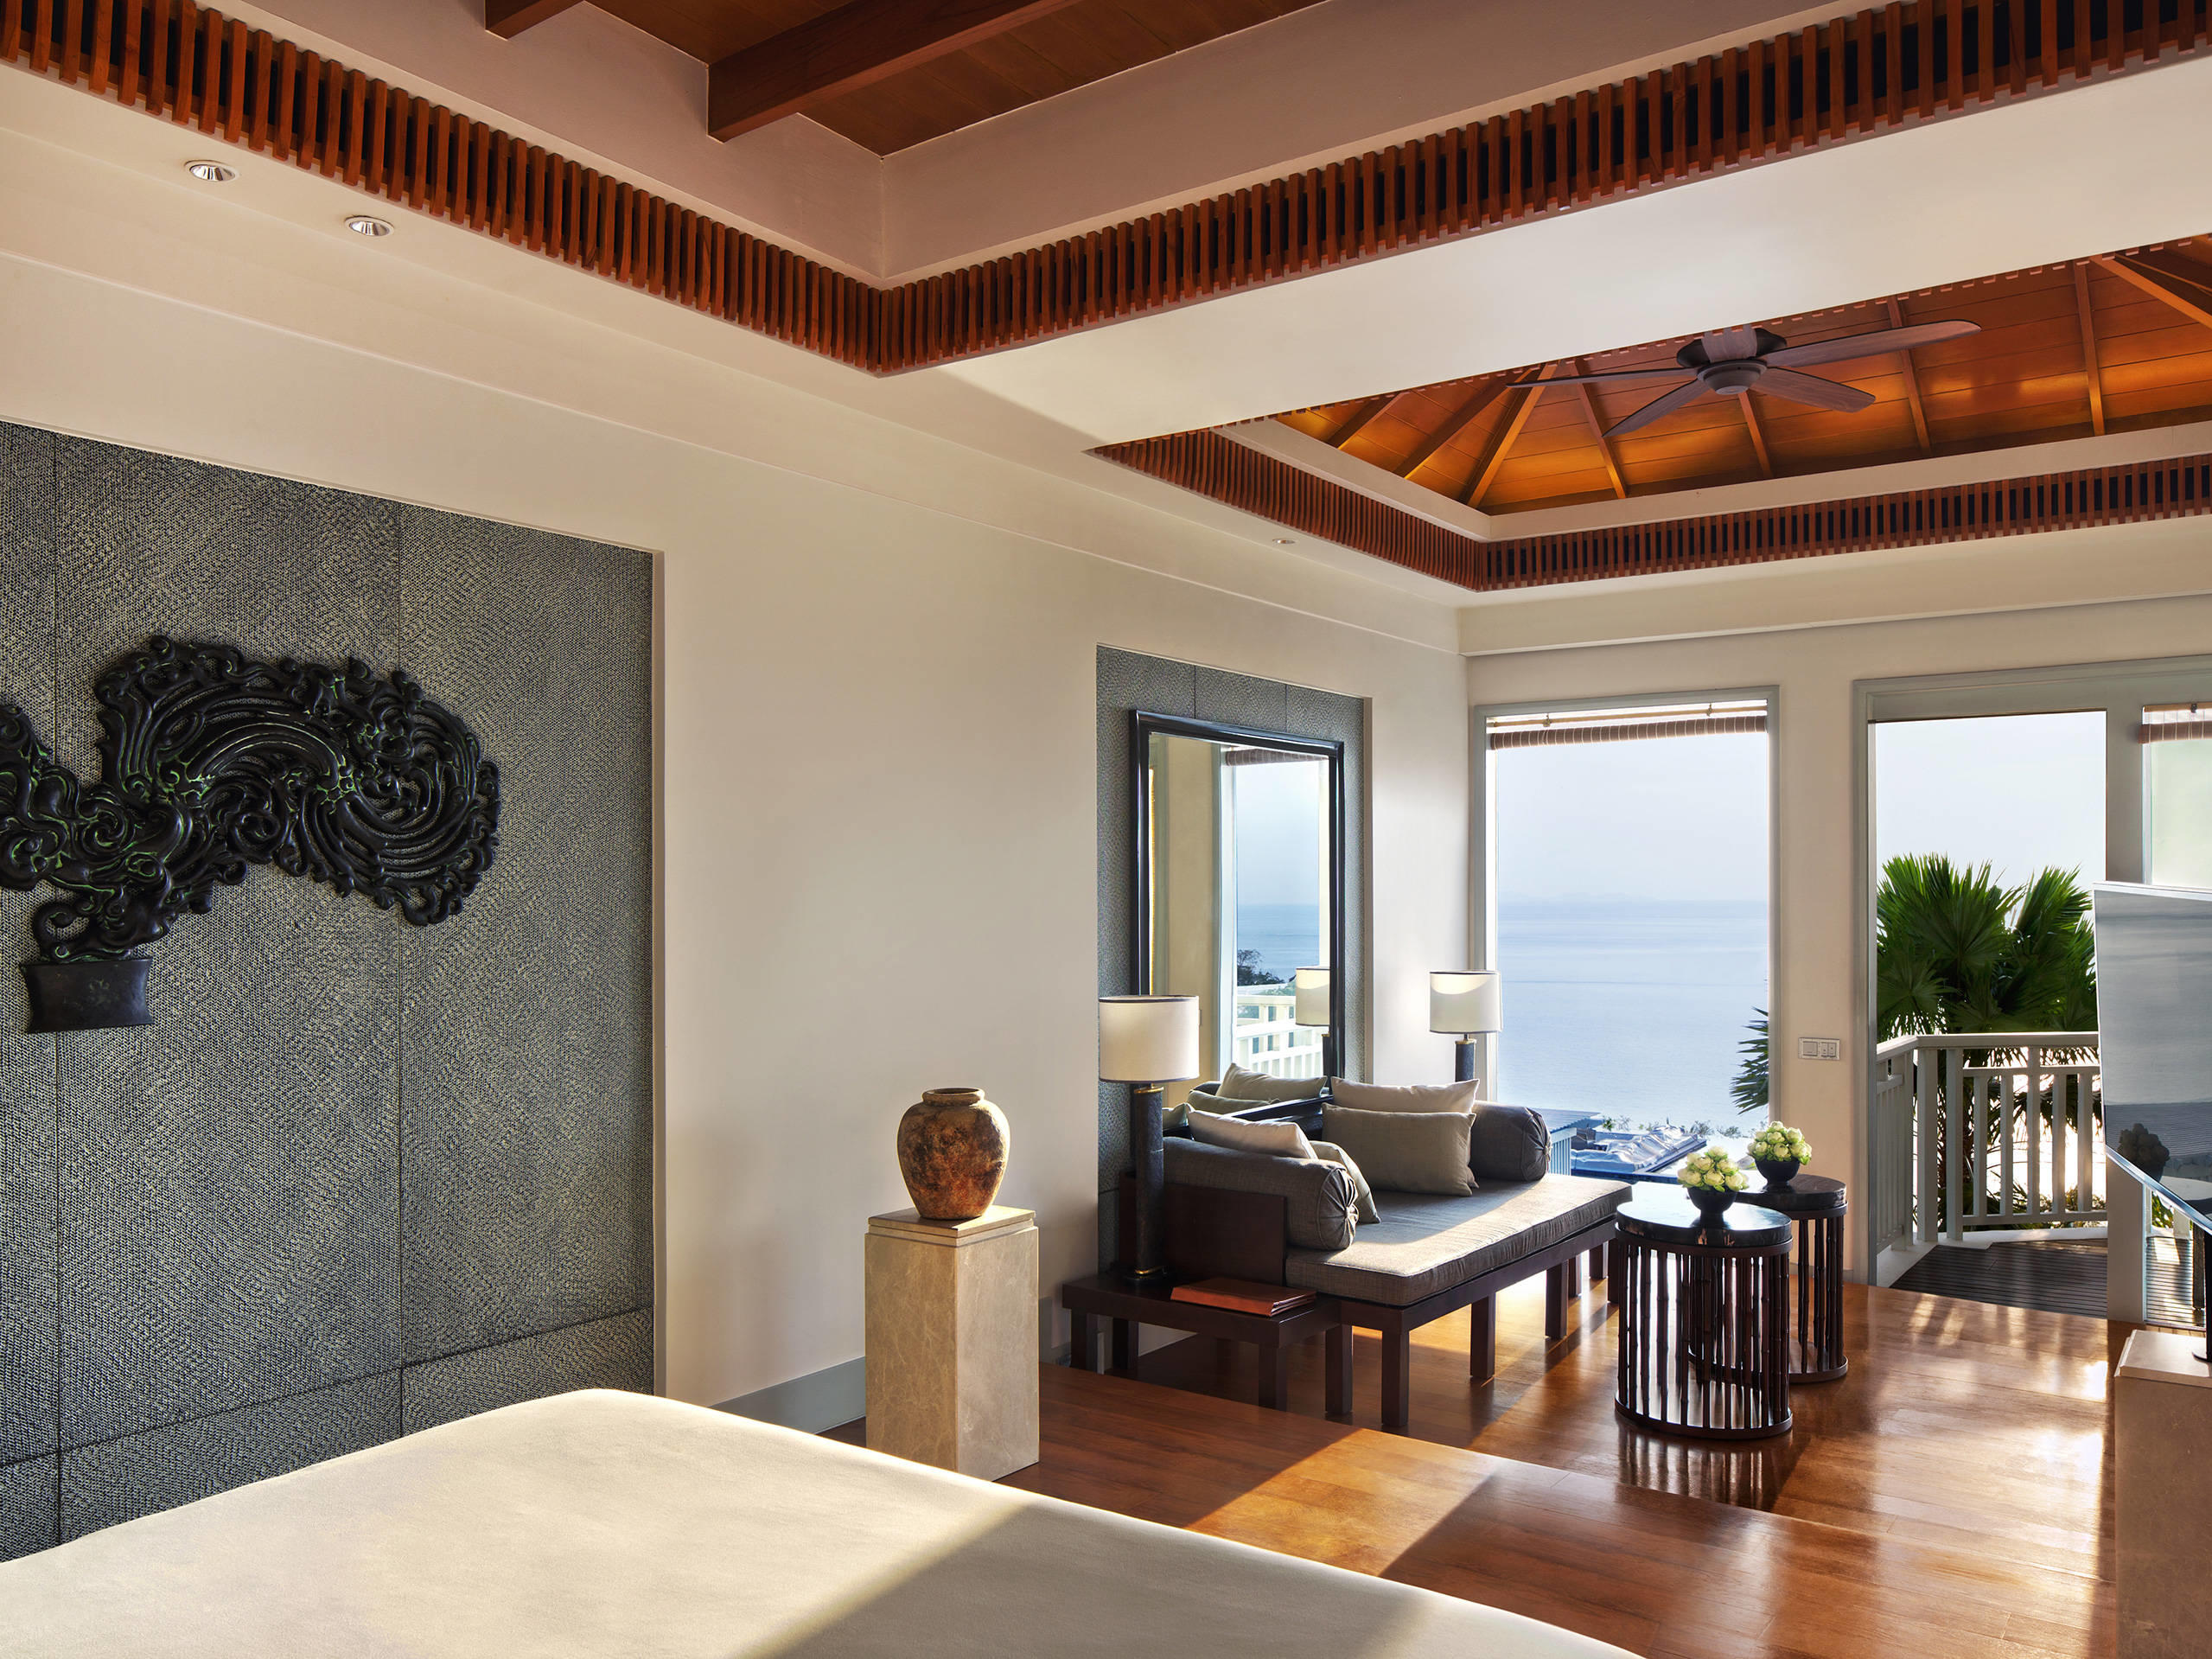 Amatara Wellness Resort - Sea View Suite living area